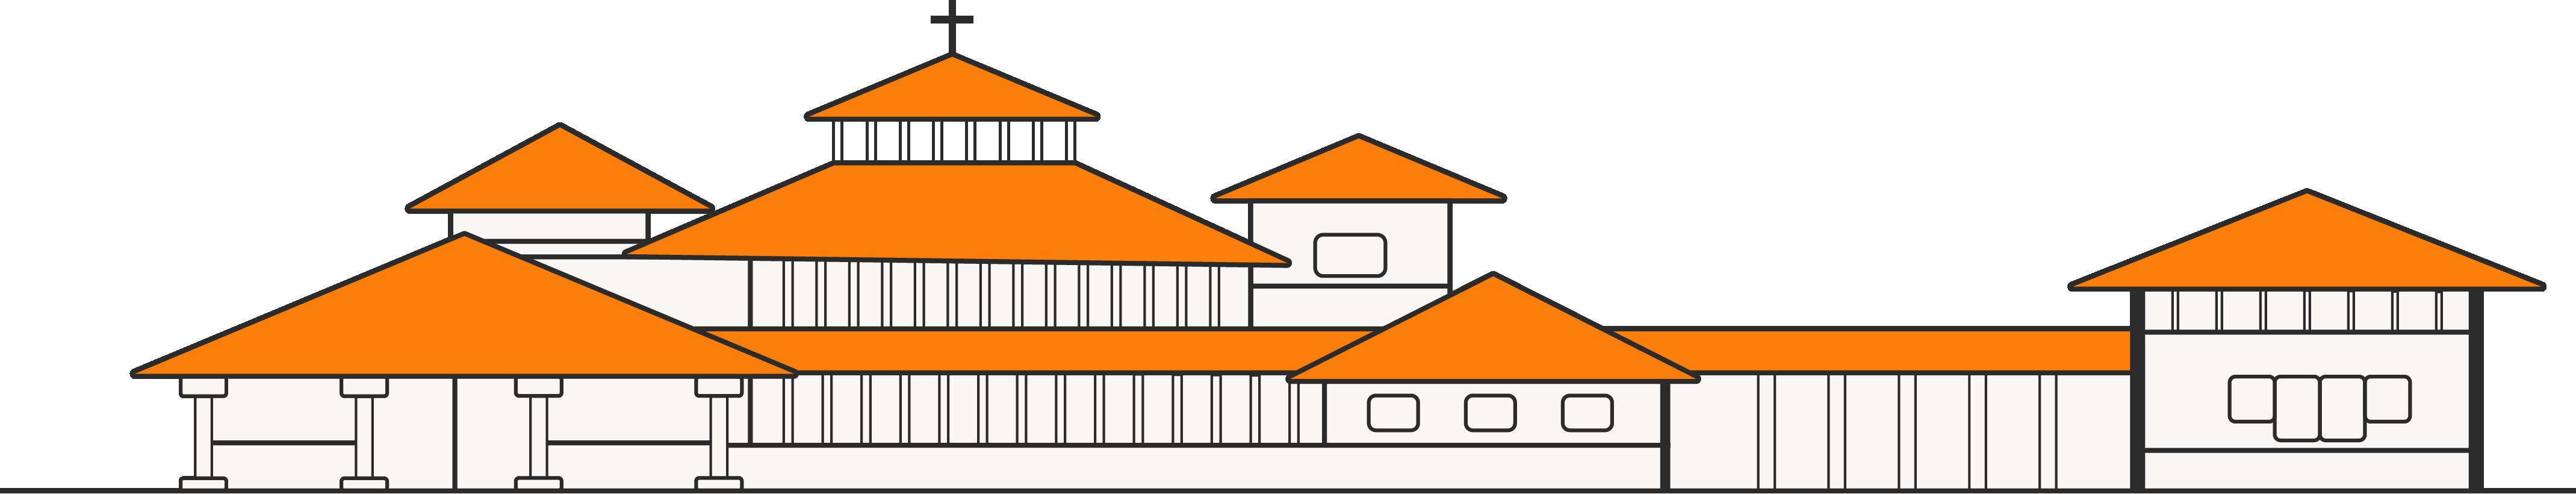 International Evangelical Church